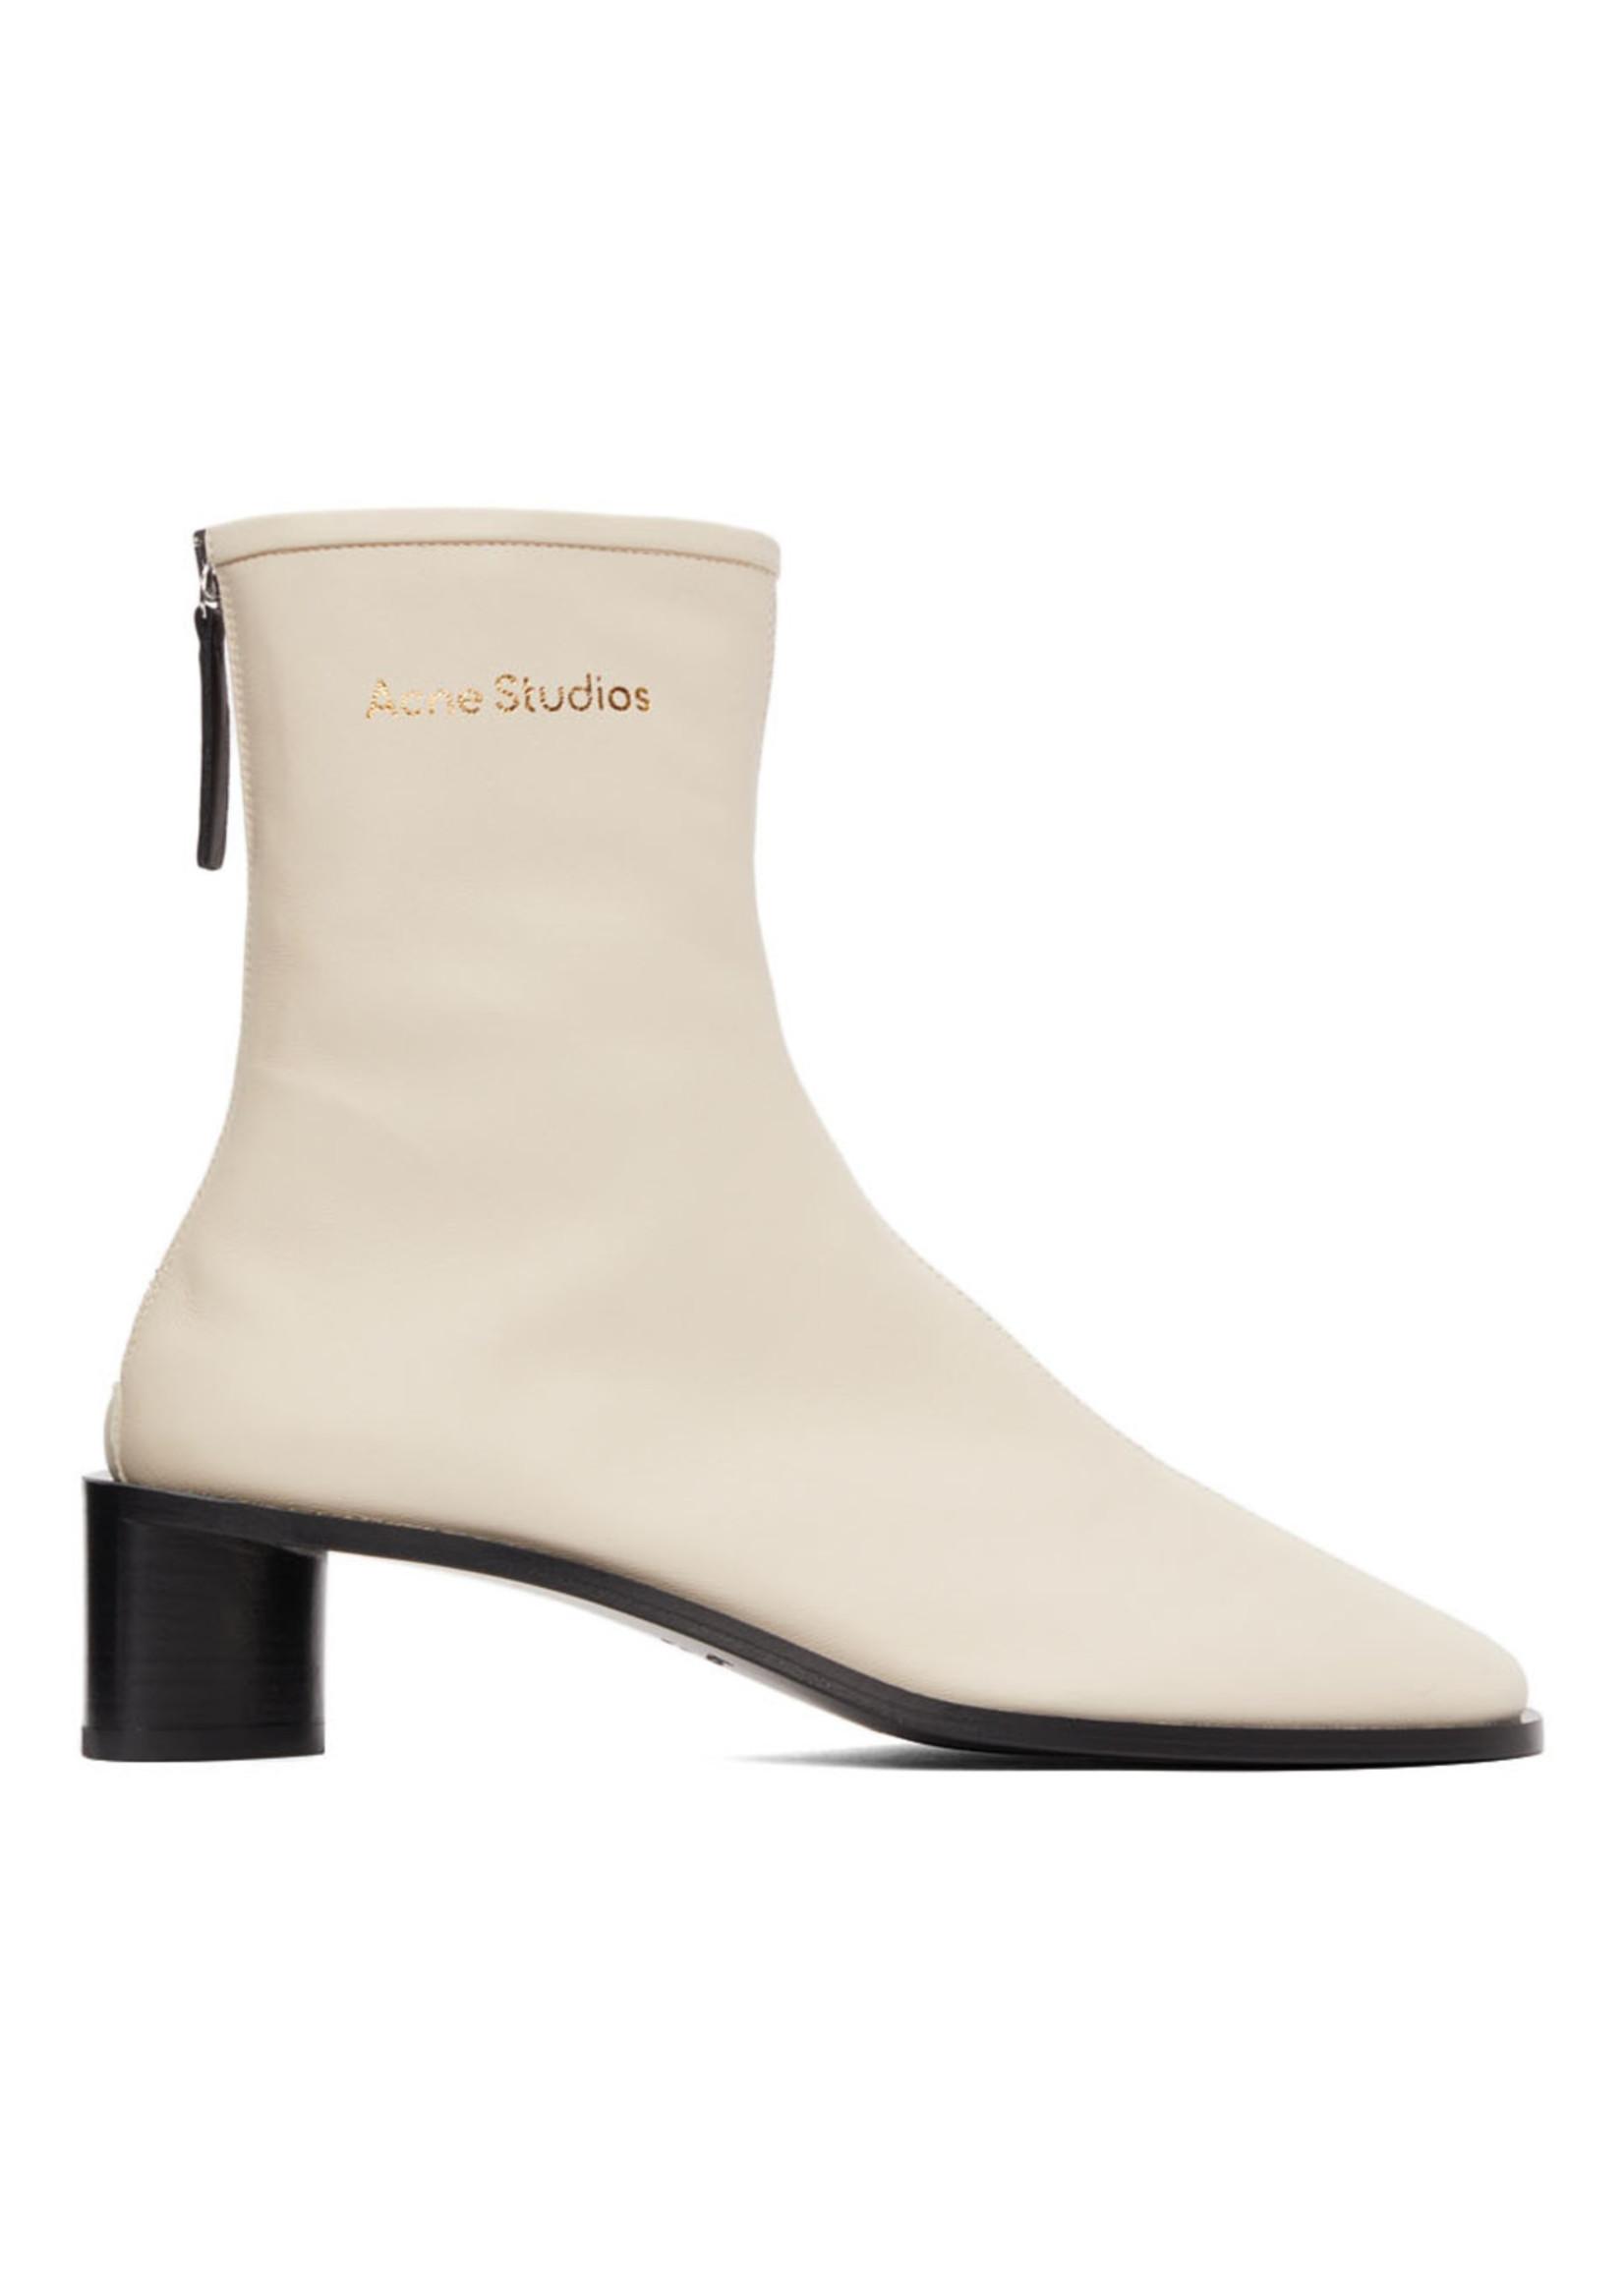 Acne Studios Acnestudios bertine boots off white 38